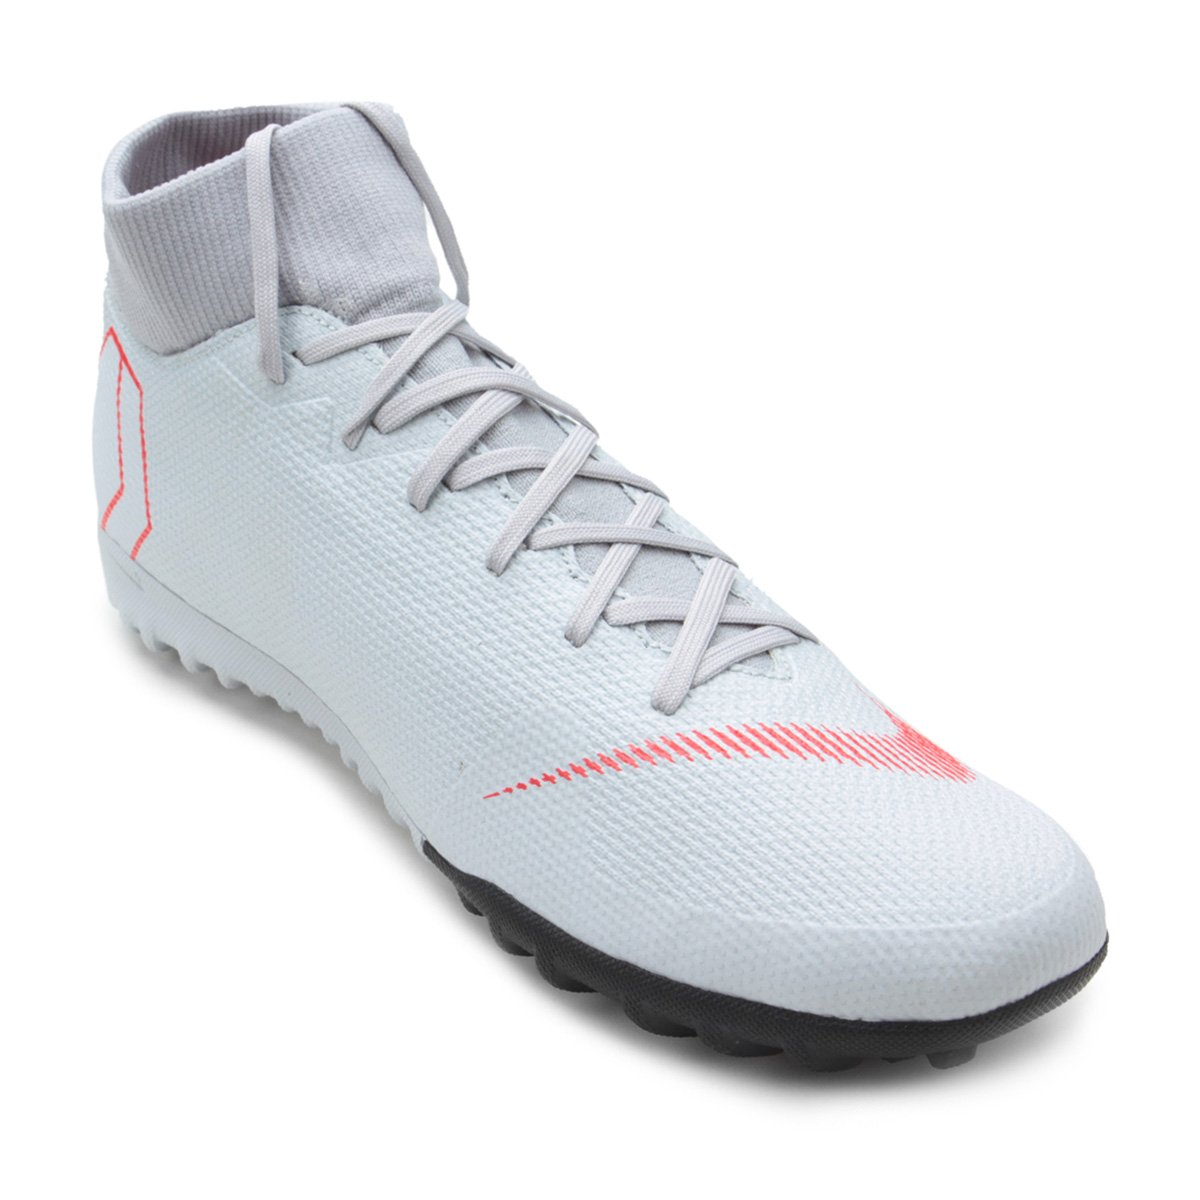 c23b3eaf81ba5 Chuteira Society Nike Mercurial Superfly 6 Academy - Cinza - Compre Agora